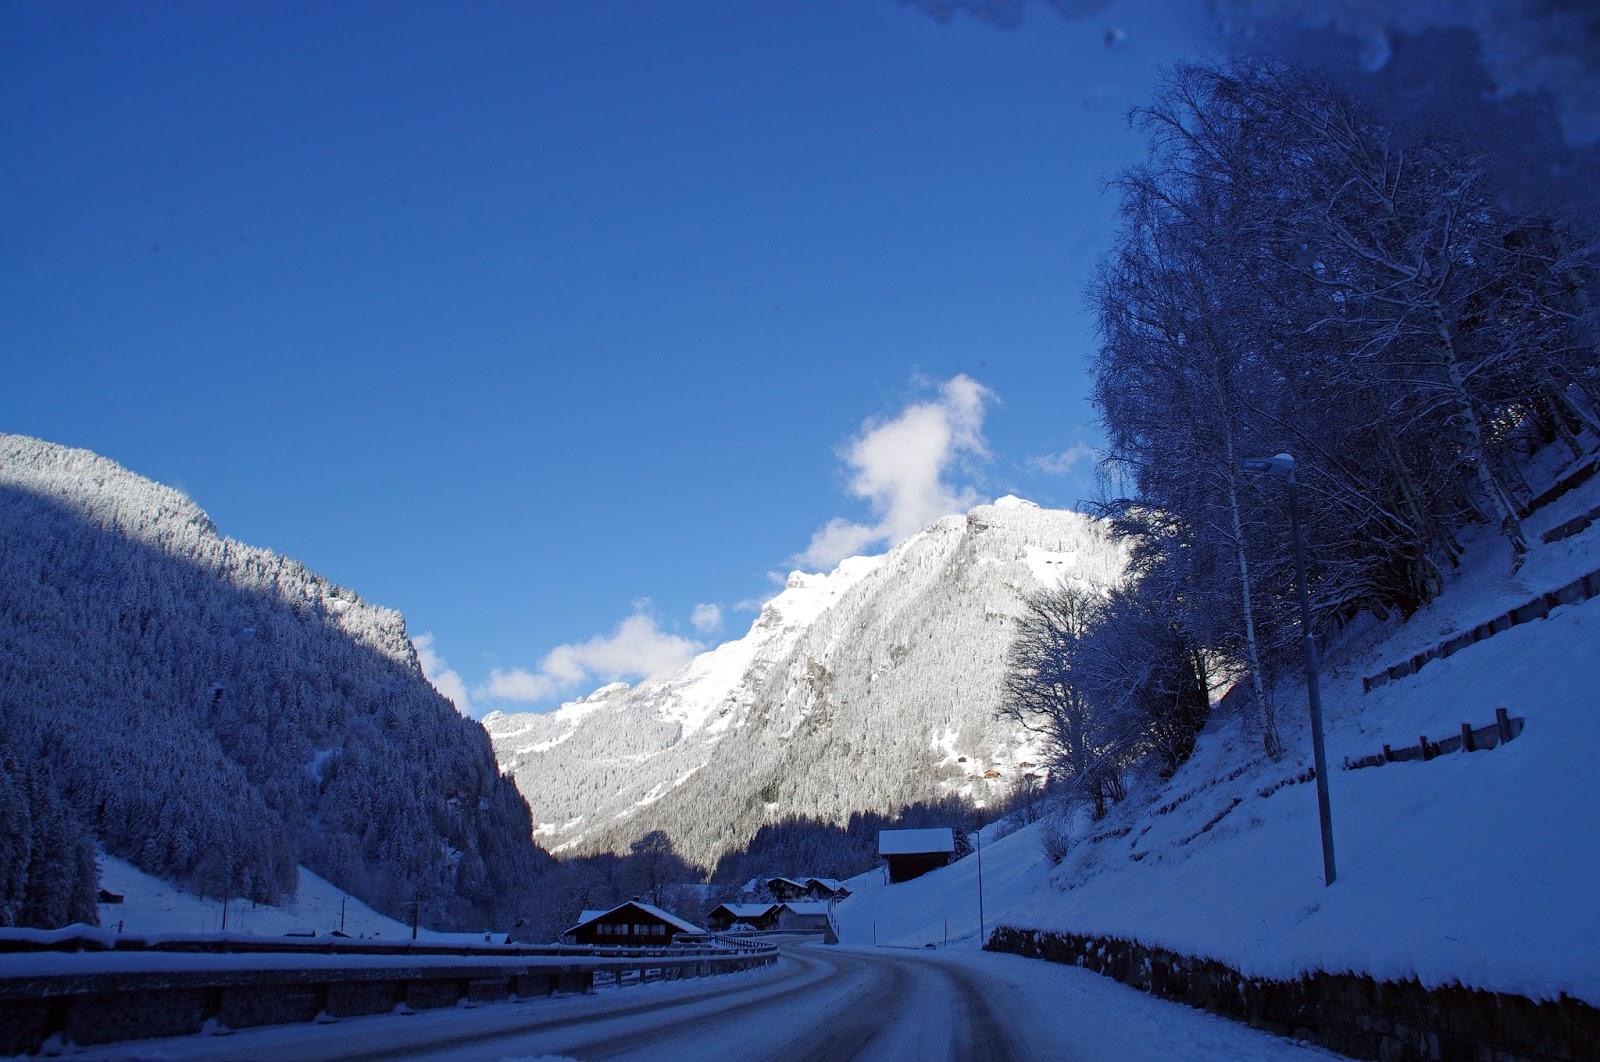 Driving Switzerland Winter